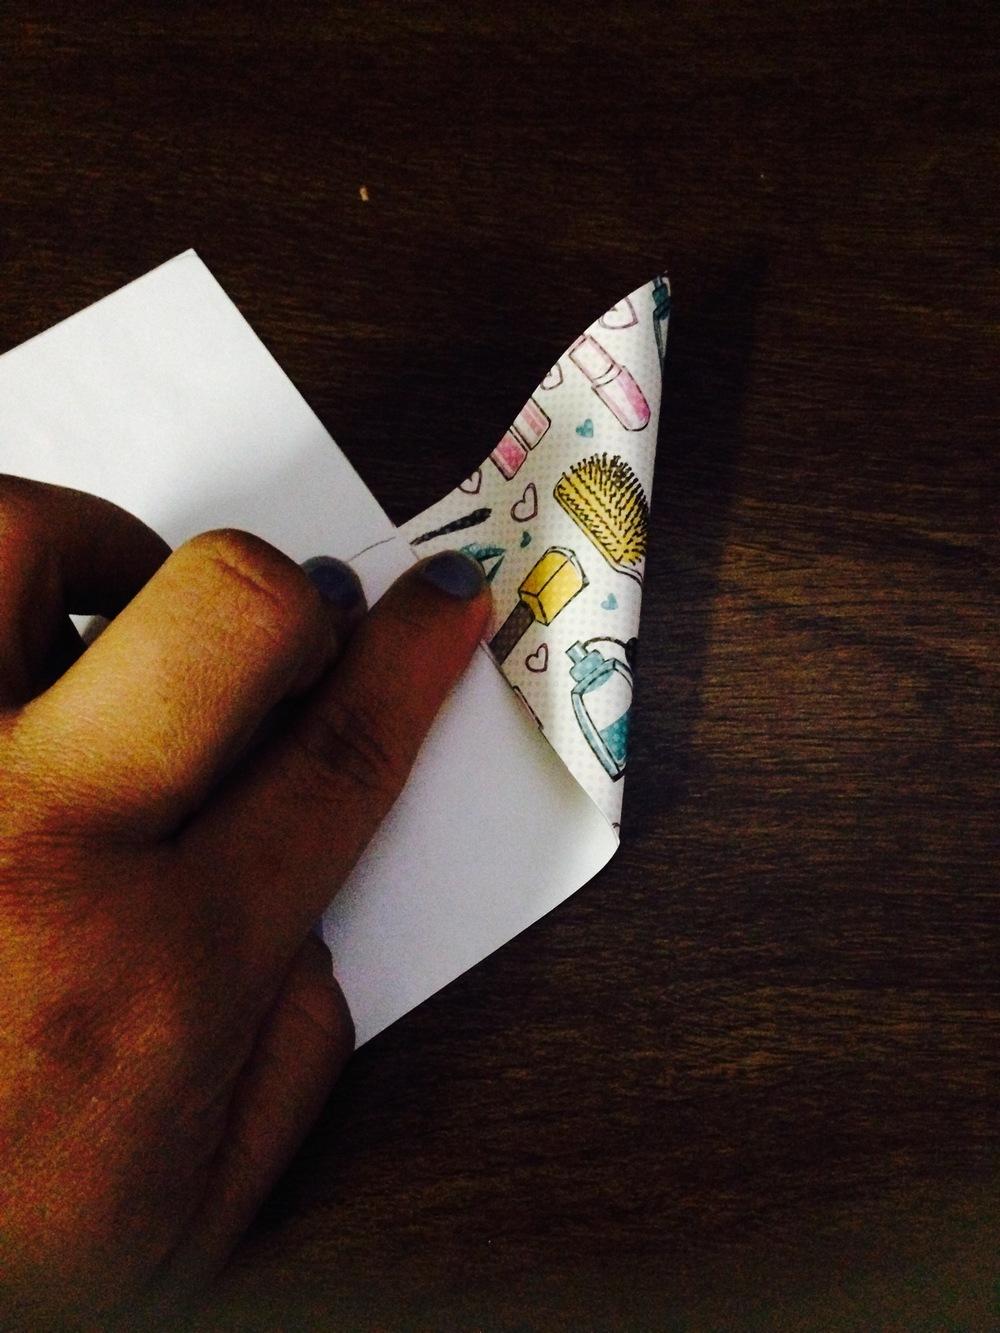 5. Fold right corner towards line